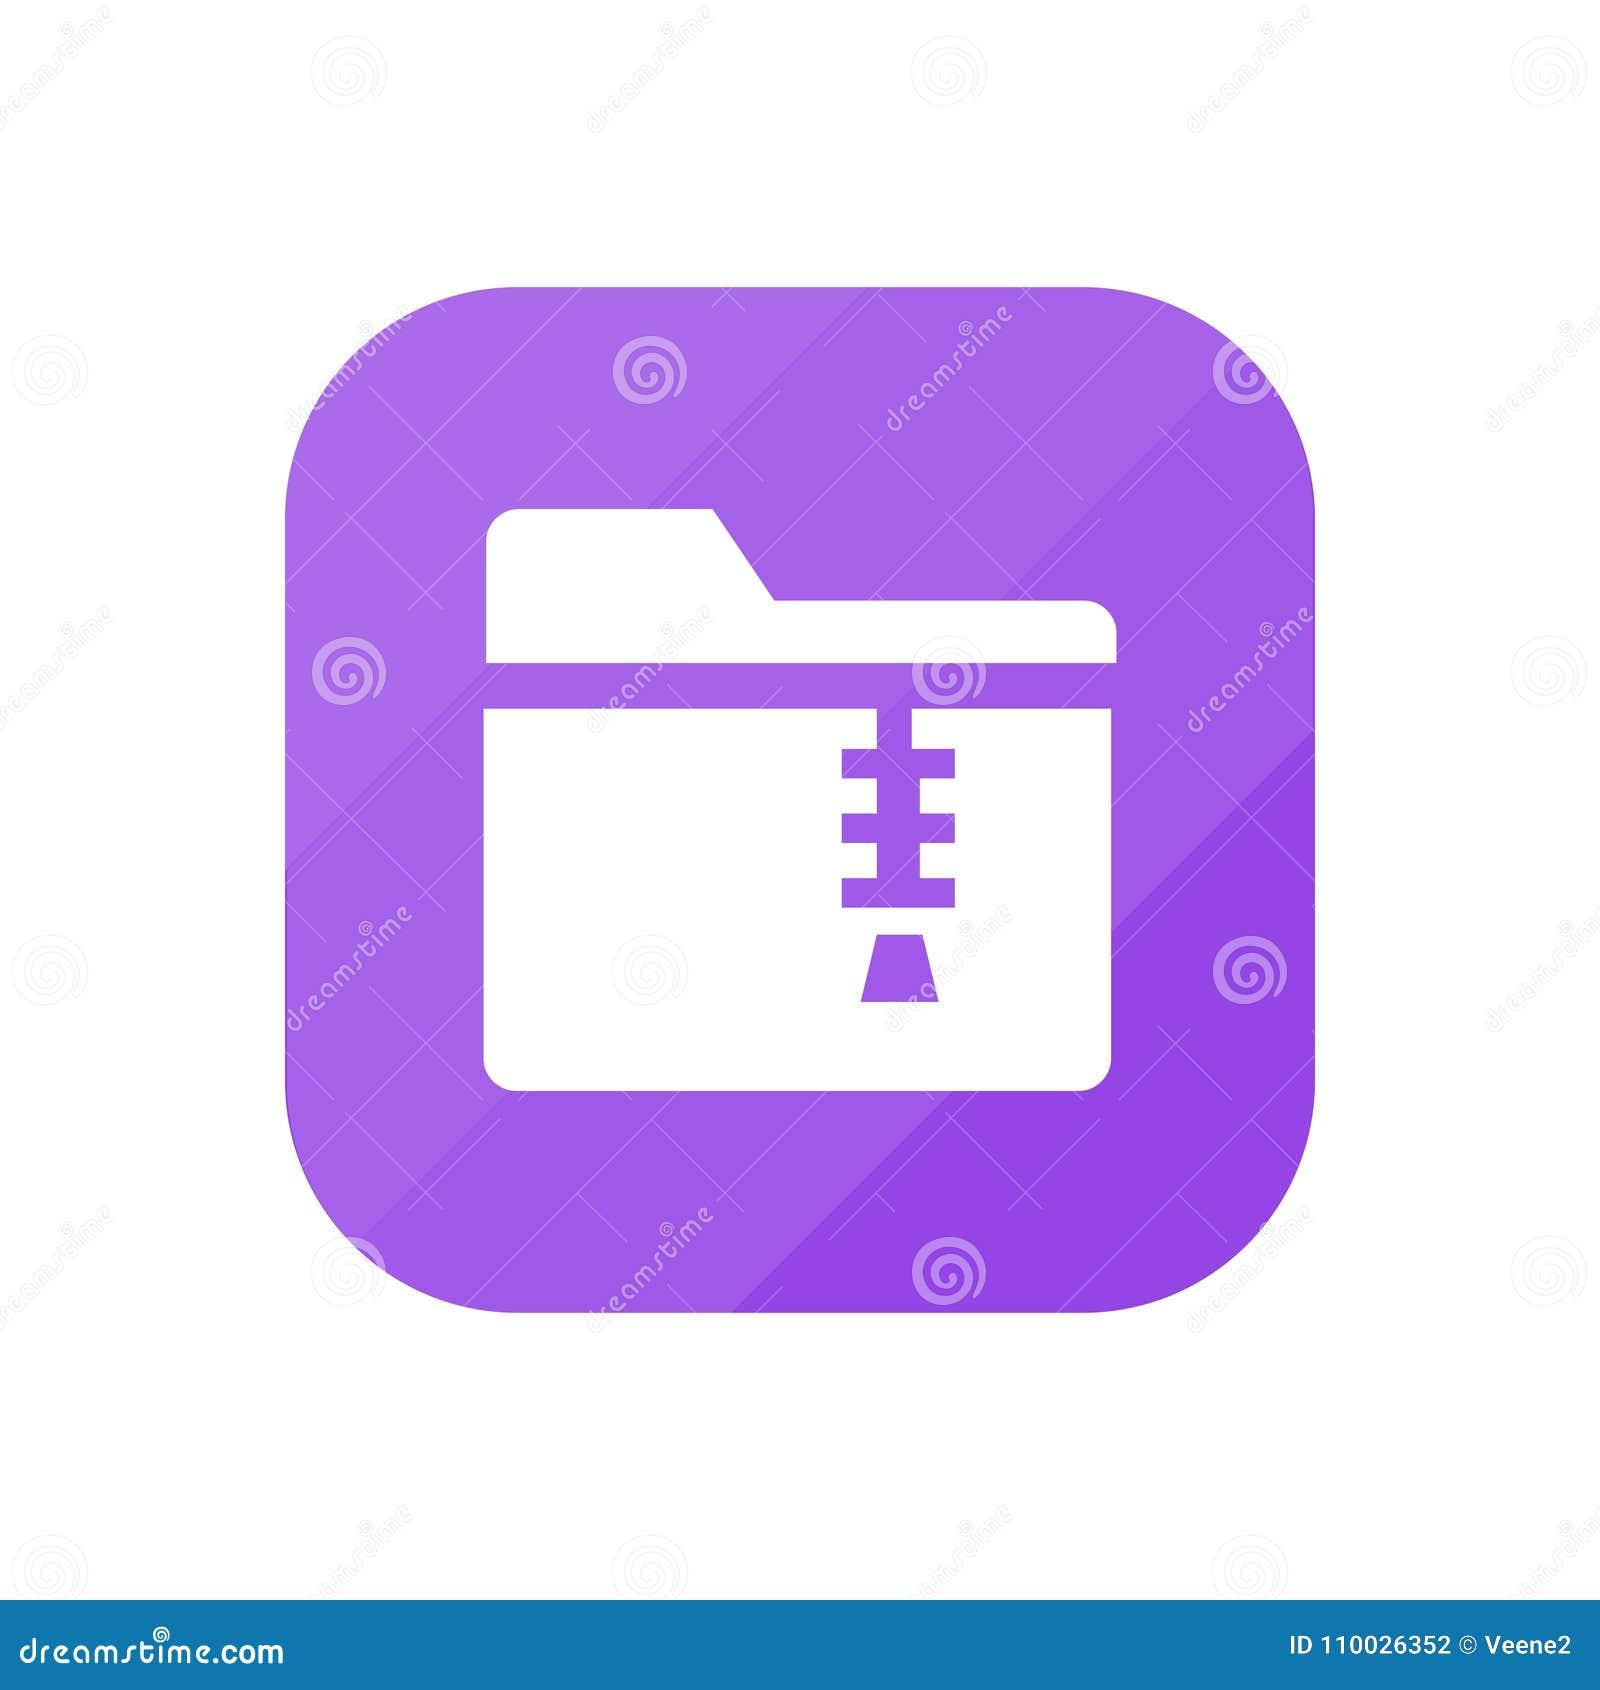 Pitomslag - App Pictogram